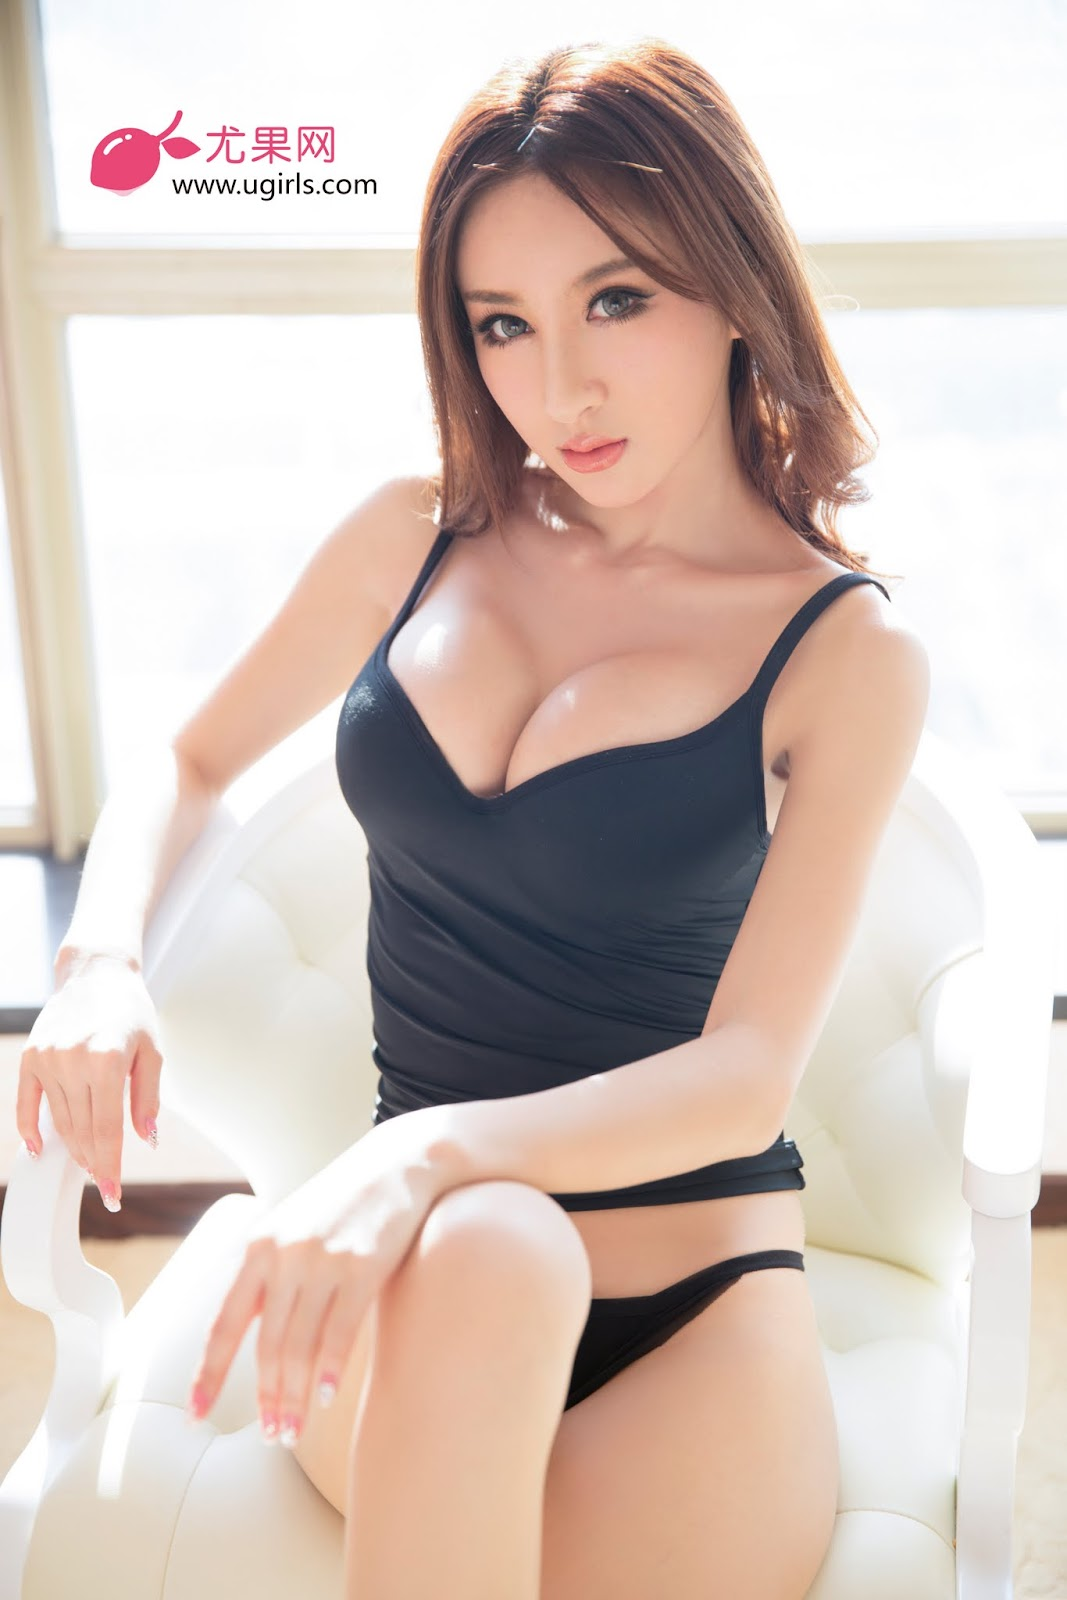 A14A6707 - Hot Photo UGIRLS NO.6 Nude Girl